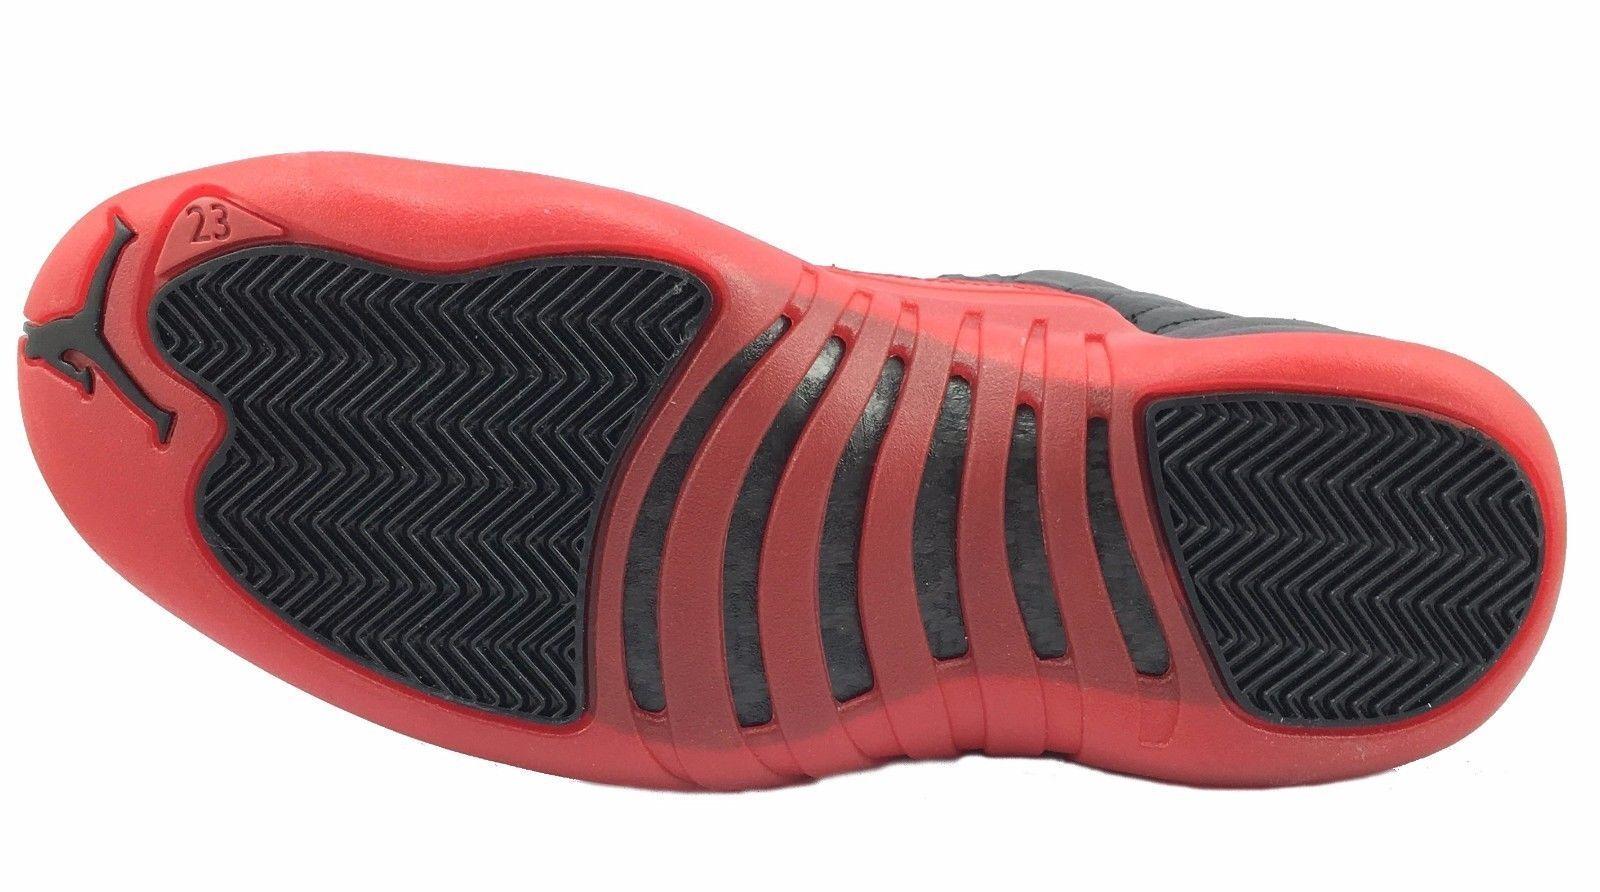 Nike air jordan grippe spiel 12 retro - xii xii xii 130690 002 d156fd